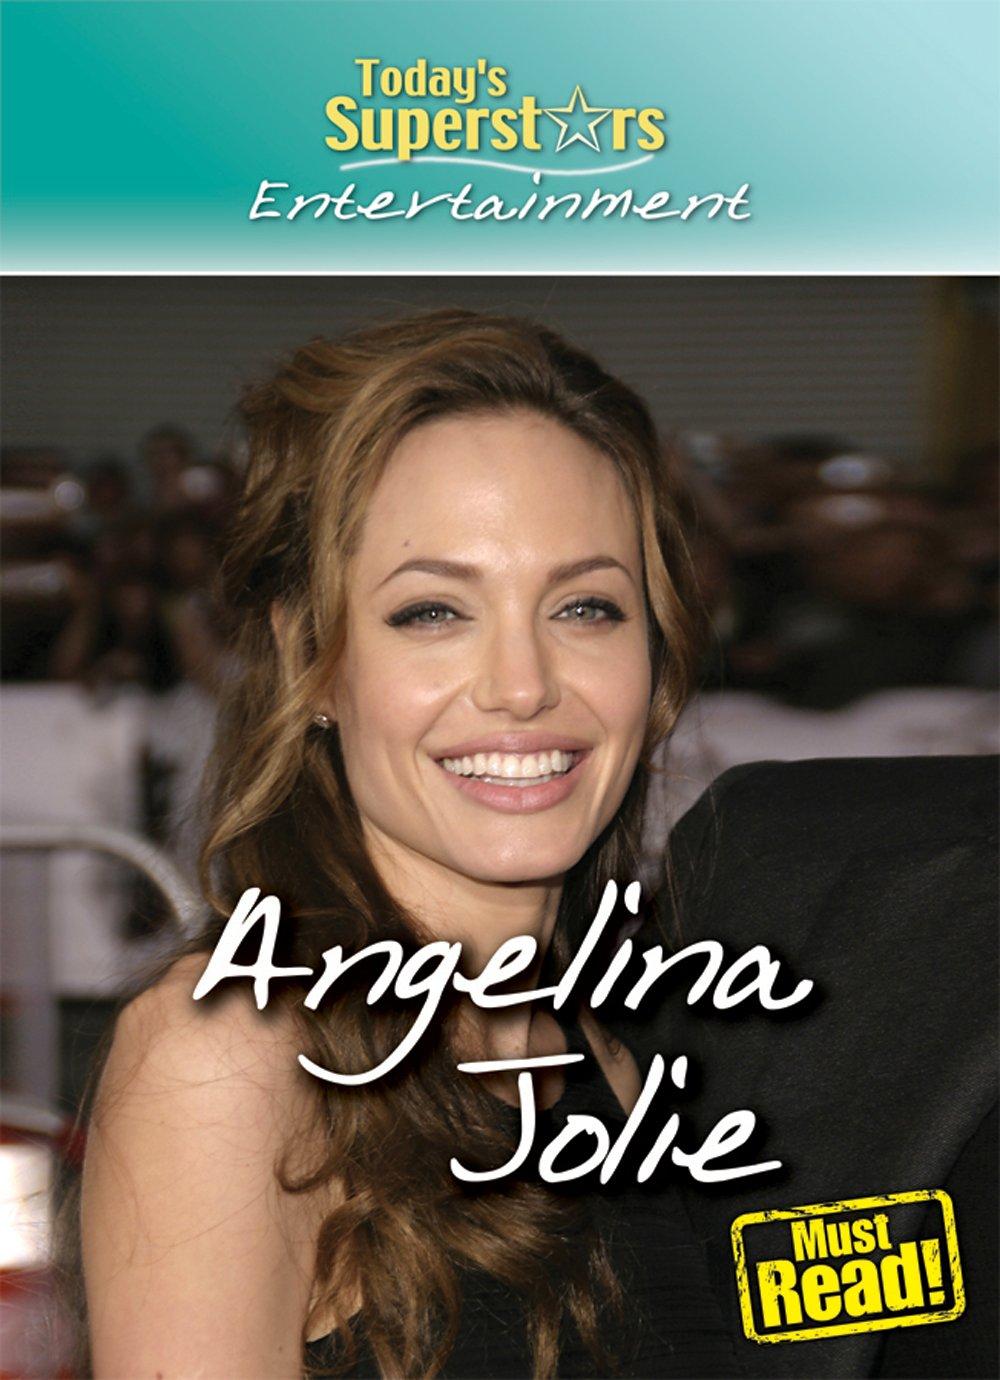 Angelina Jolie (Today's Superstars, Entertainment)